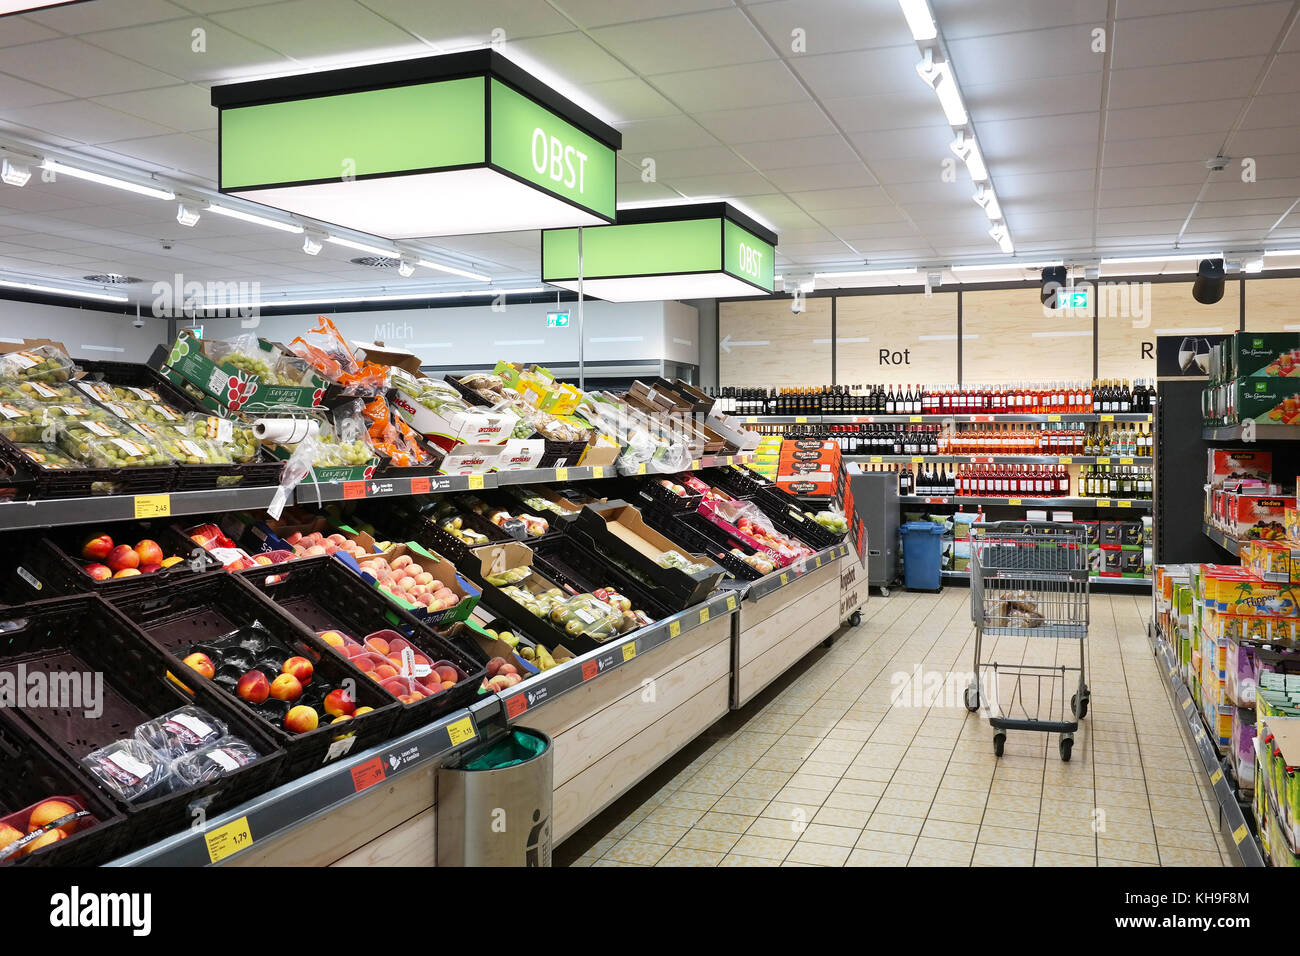 Interior of an Aldi Sud discount supermarket - Stock Image